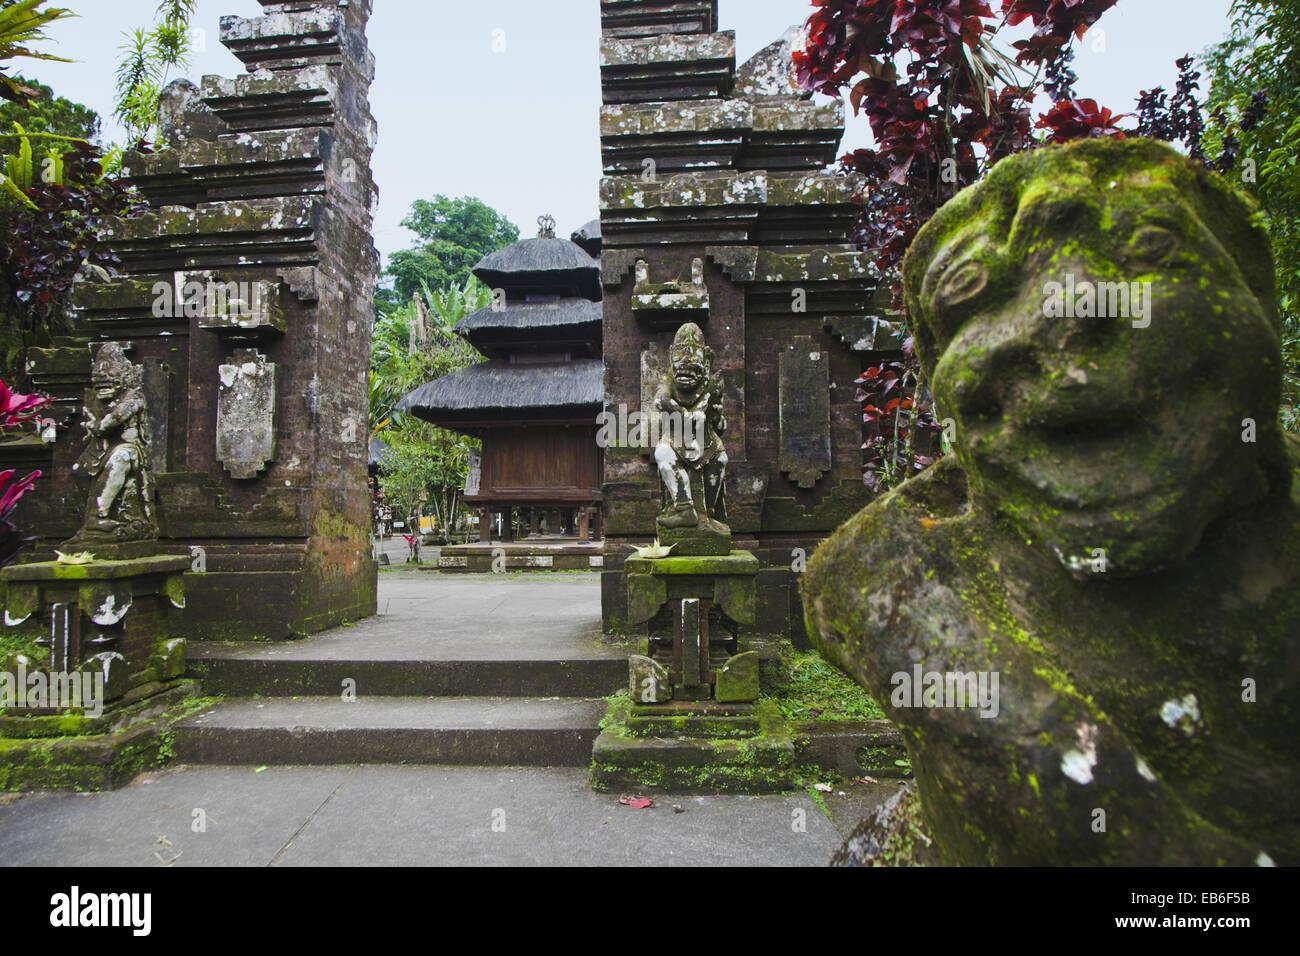 Pura Luhur Batukau temple, Bali, Indonesia Stock Photo